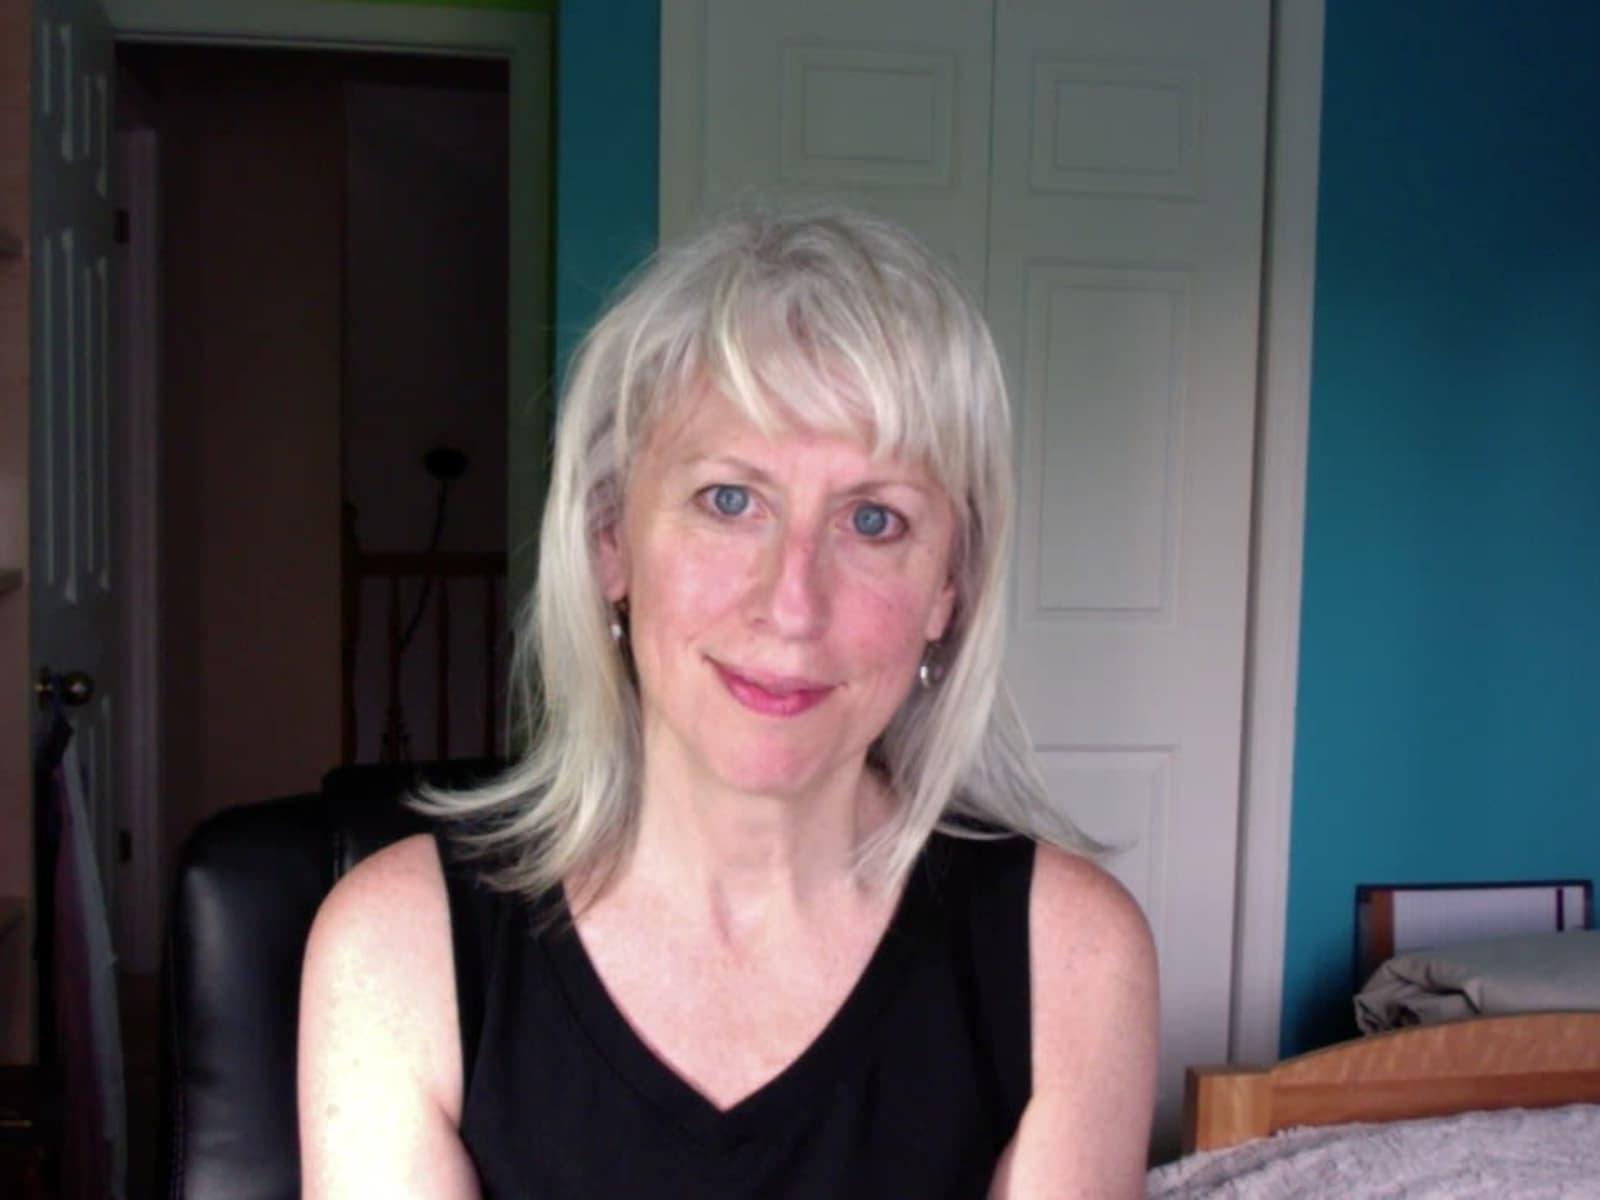 Jennifer from Cornwall, Ontario, Canada